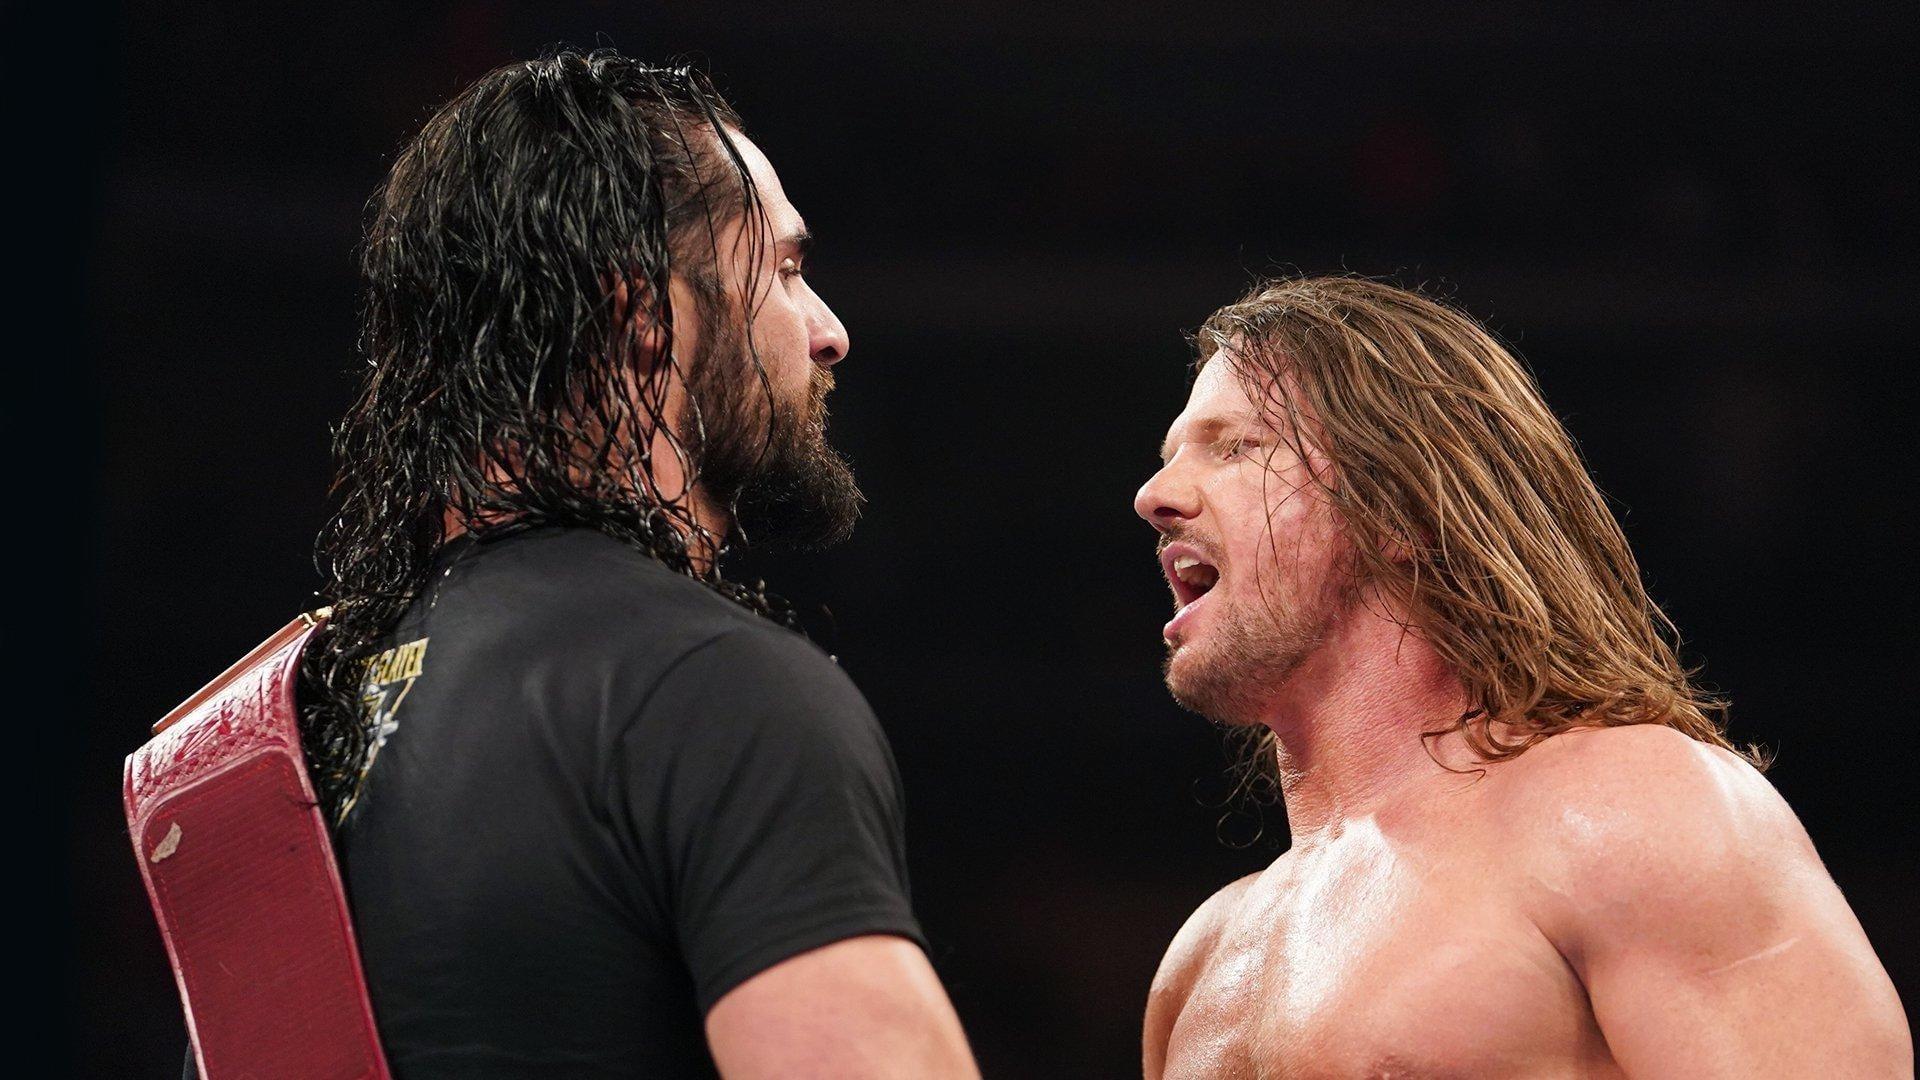 WWE Raw Season 27 :Episode 16  April 22, 2019 (Des Moines, IA)